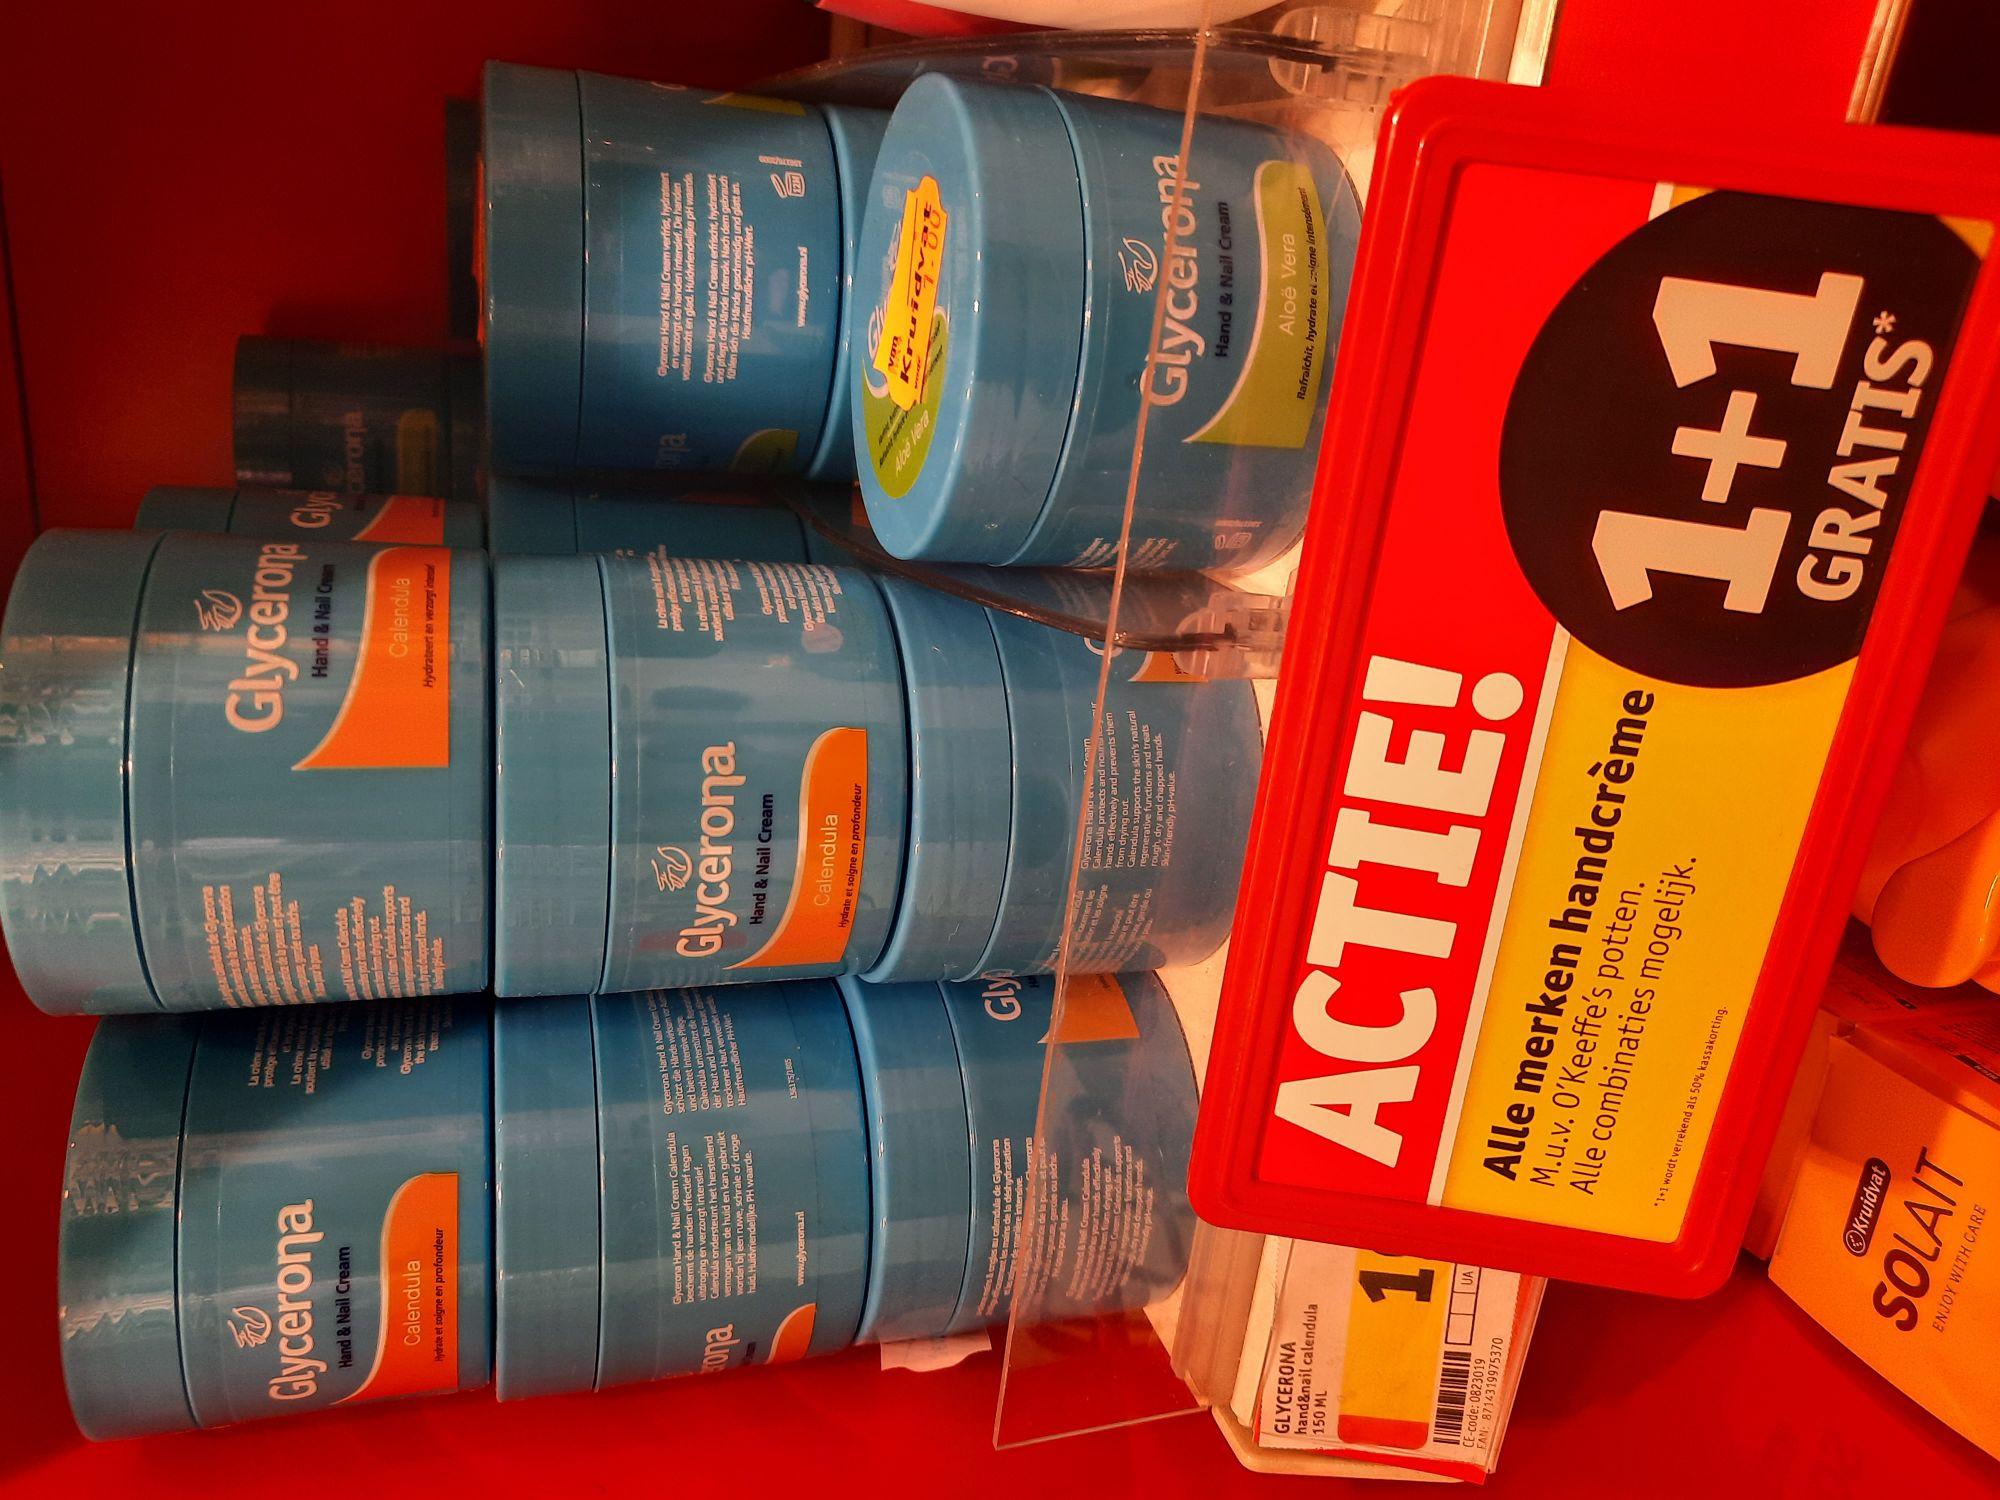 Glycerona handcreme 2 voor €1,- @Kruidvat